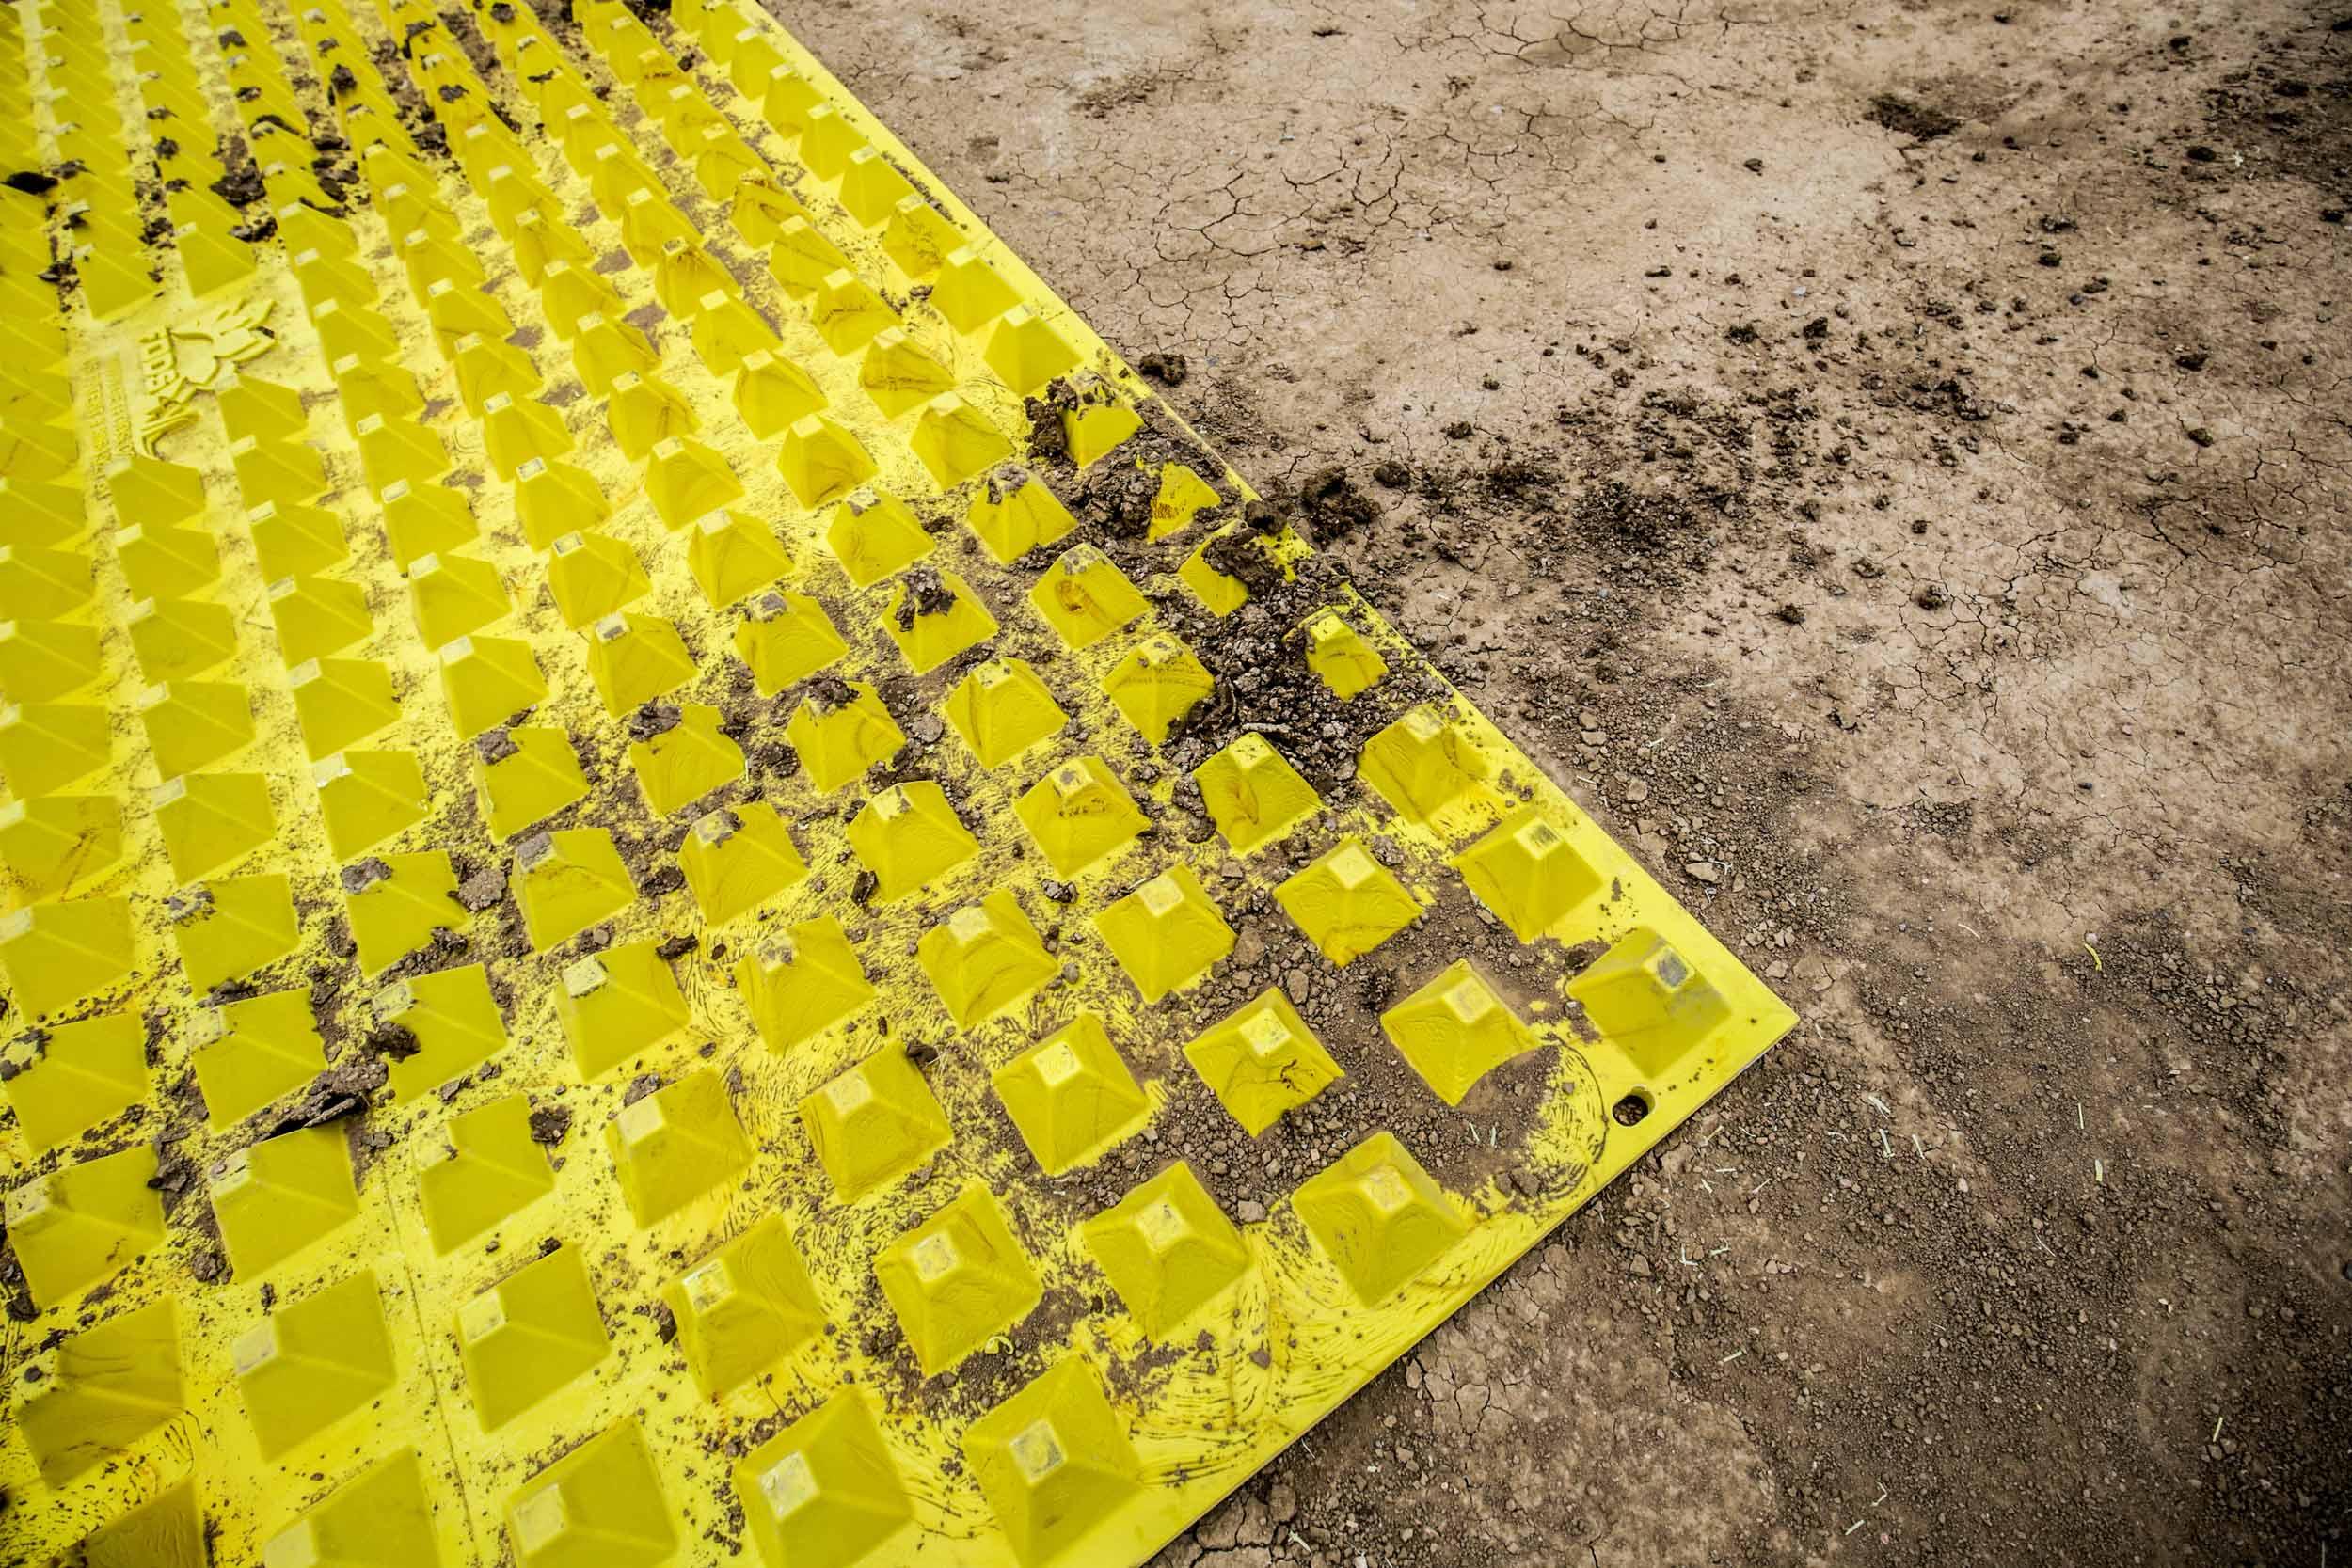 +FODS+trackout+control+construction+entrance+bmp+muddy+construction+site+wheelwash+rumblepad+stabilized+construction+entrance+commercial+construction+site.jpg